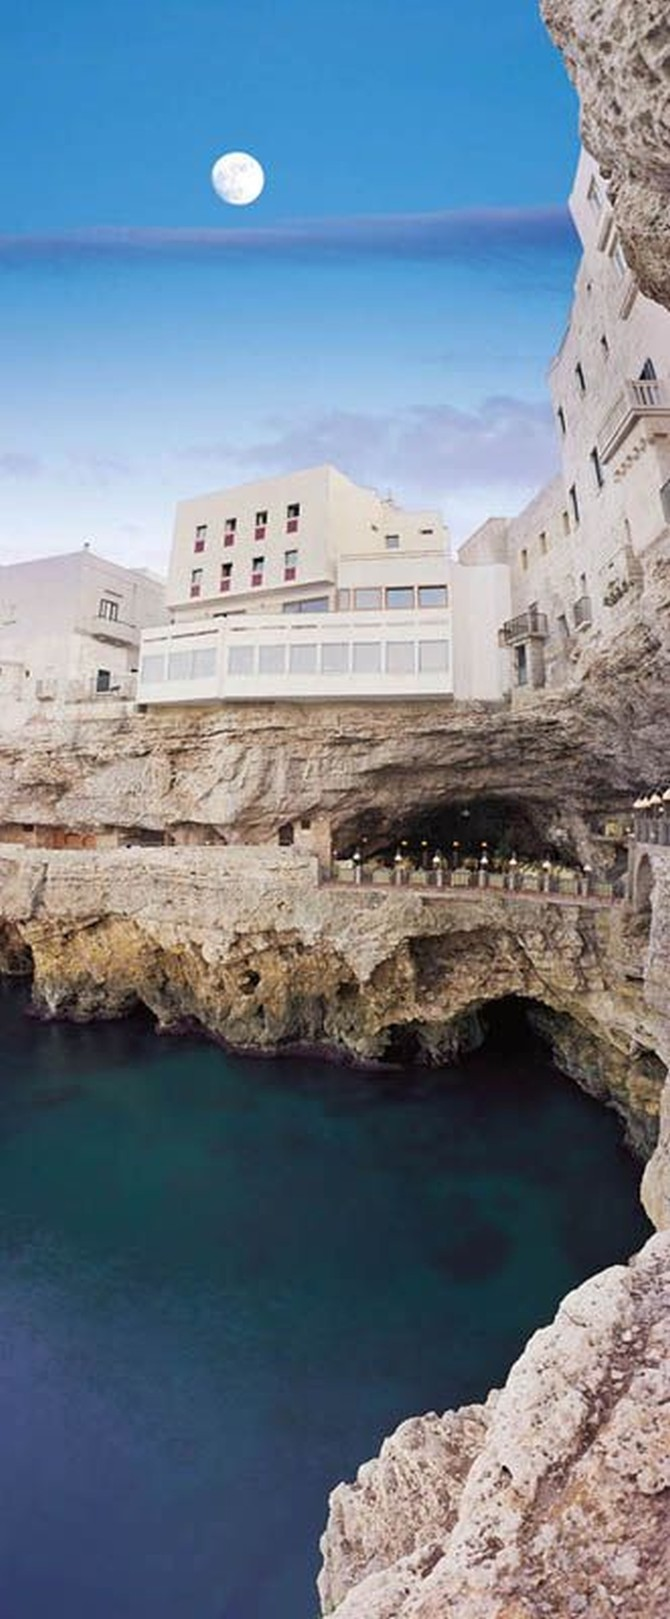 Grotta Palazzese, отель-ресторан в гроте, Апулия, Италия